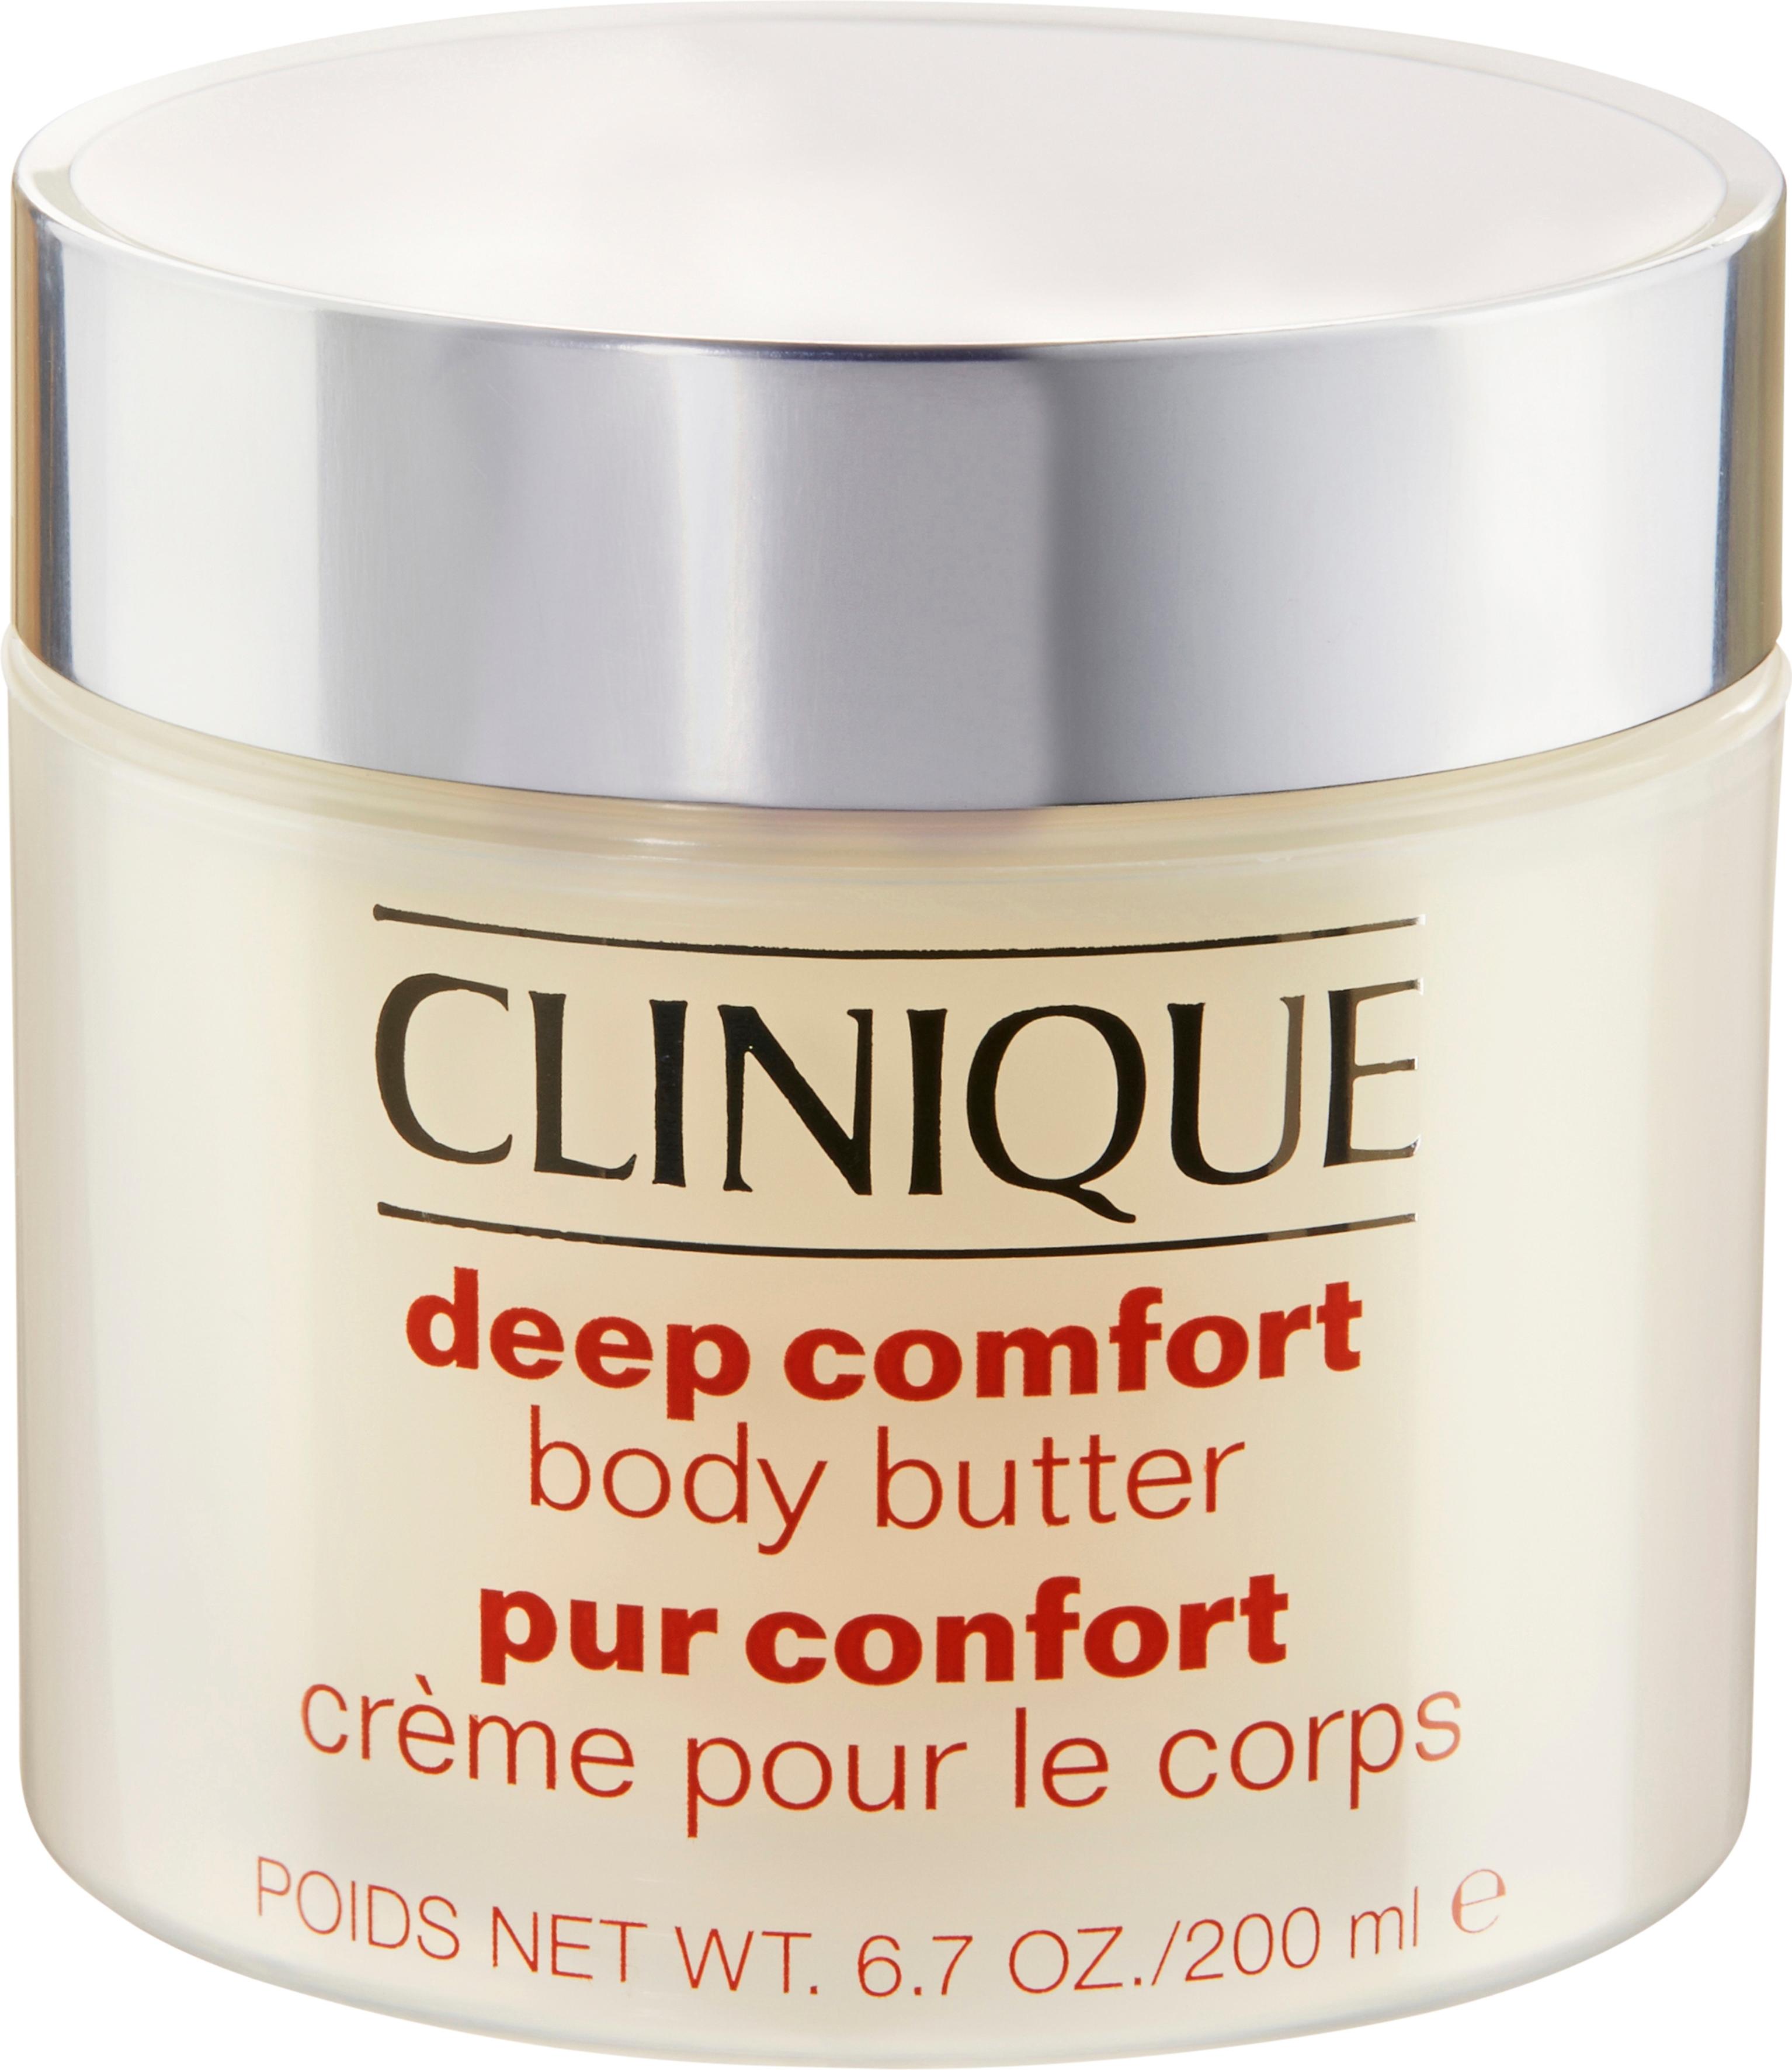 CLINIQUE bodycrème Deep Comfort Body Butter veilig op otto.nl kopen